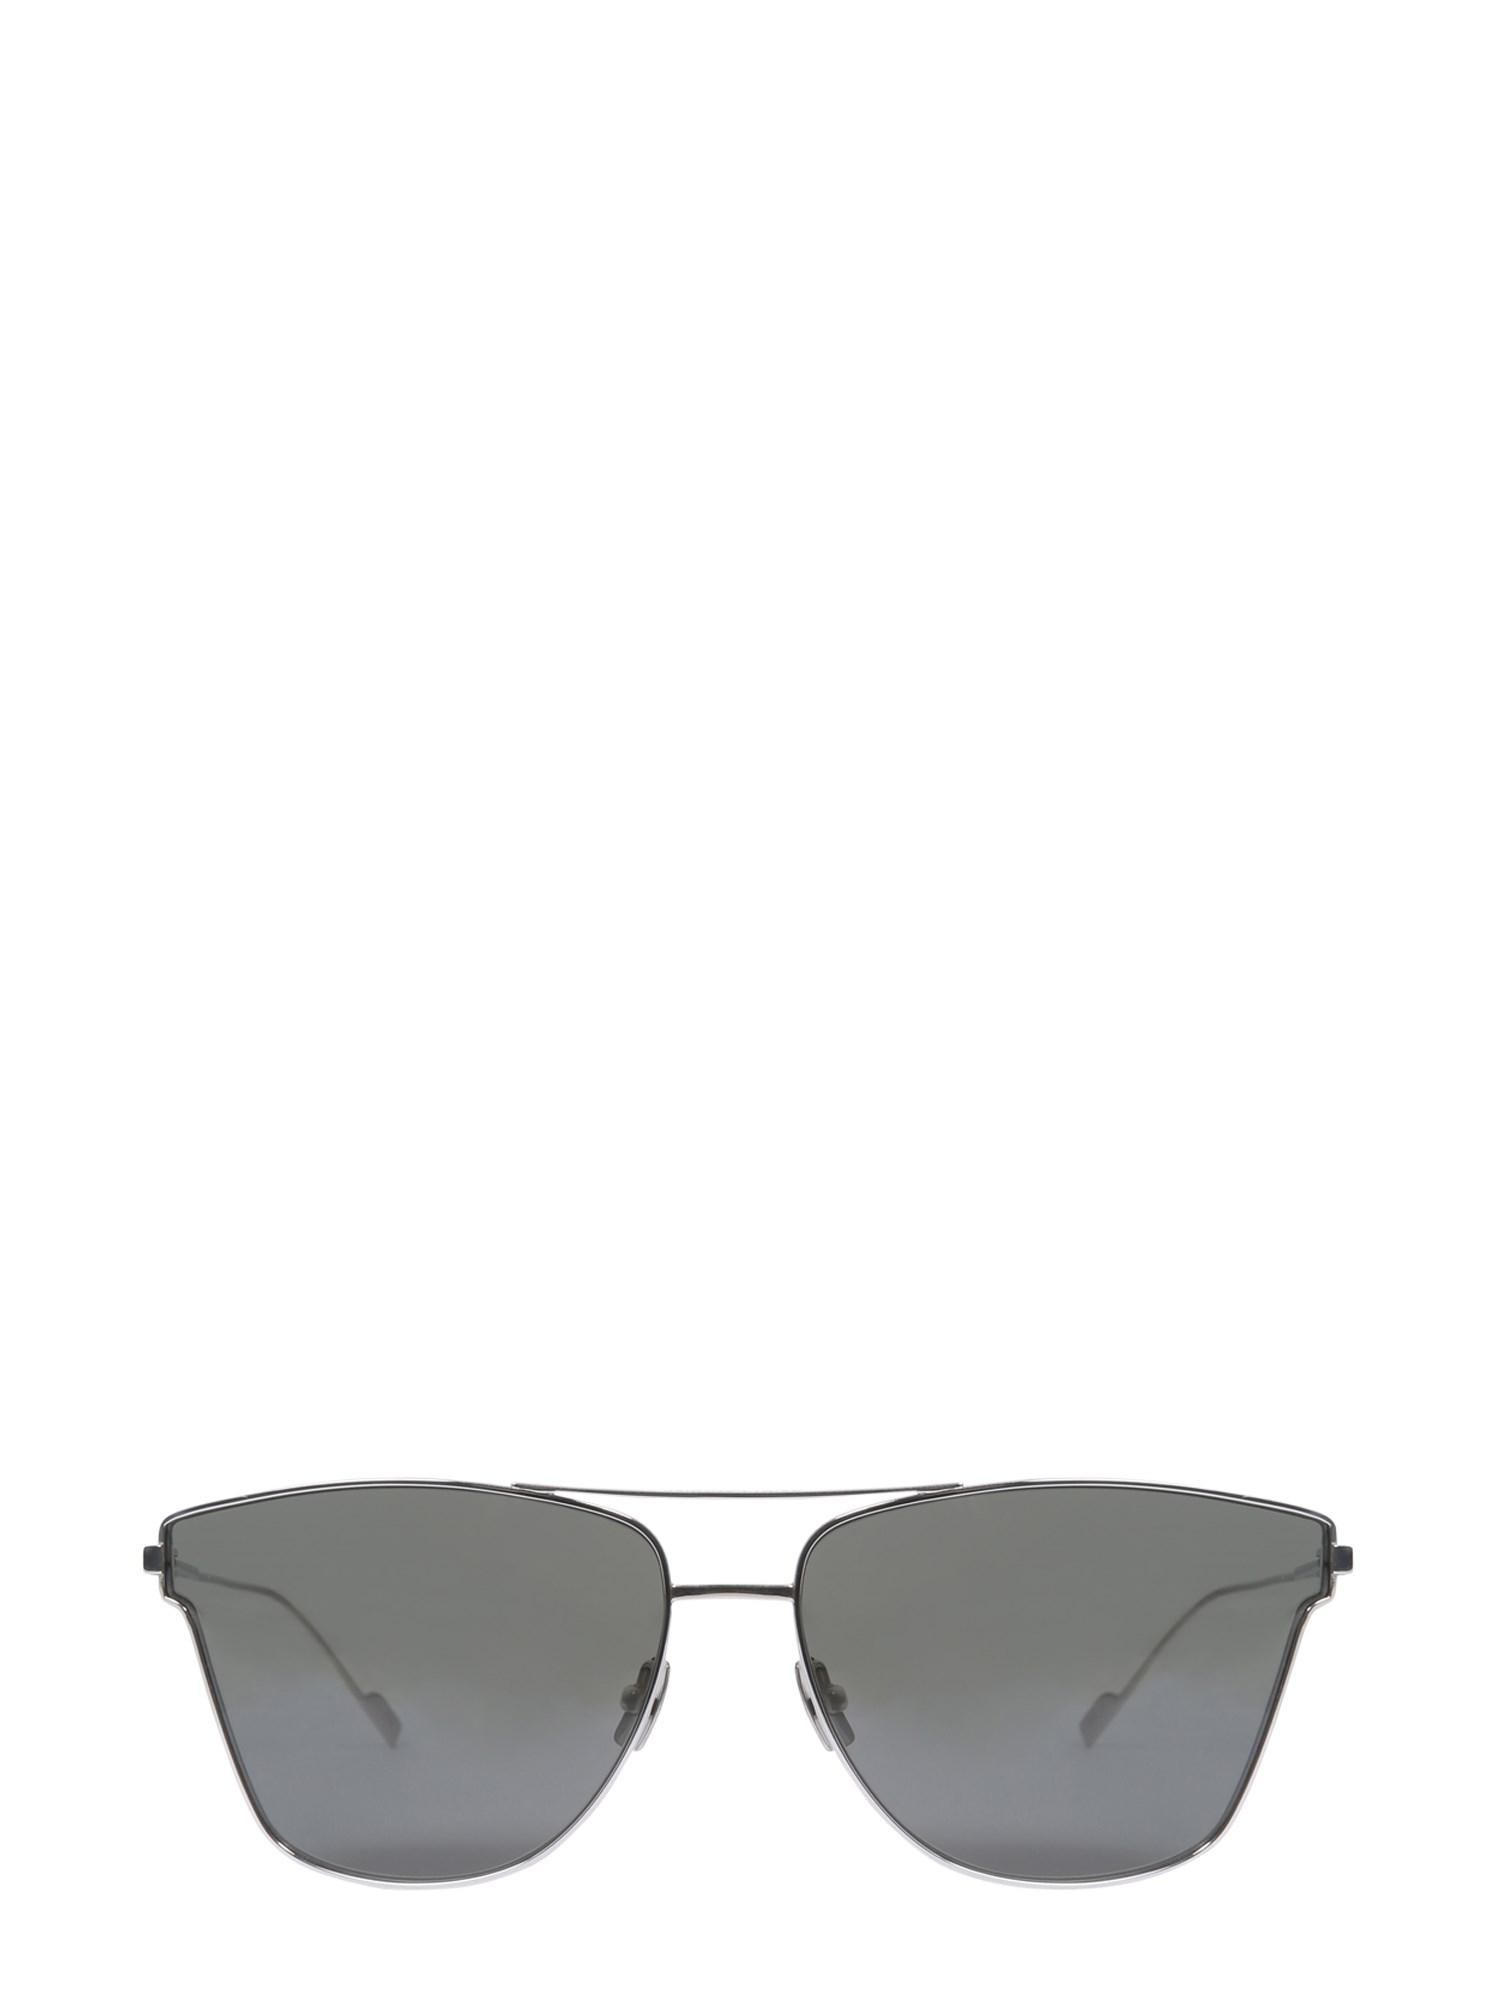 saint laurent classic sl51 sunglasses